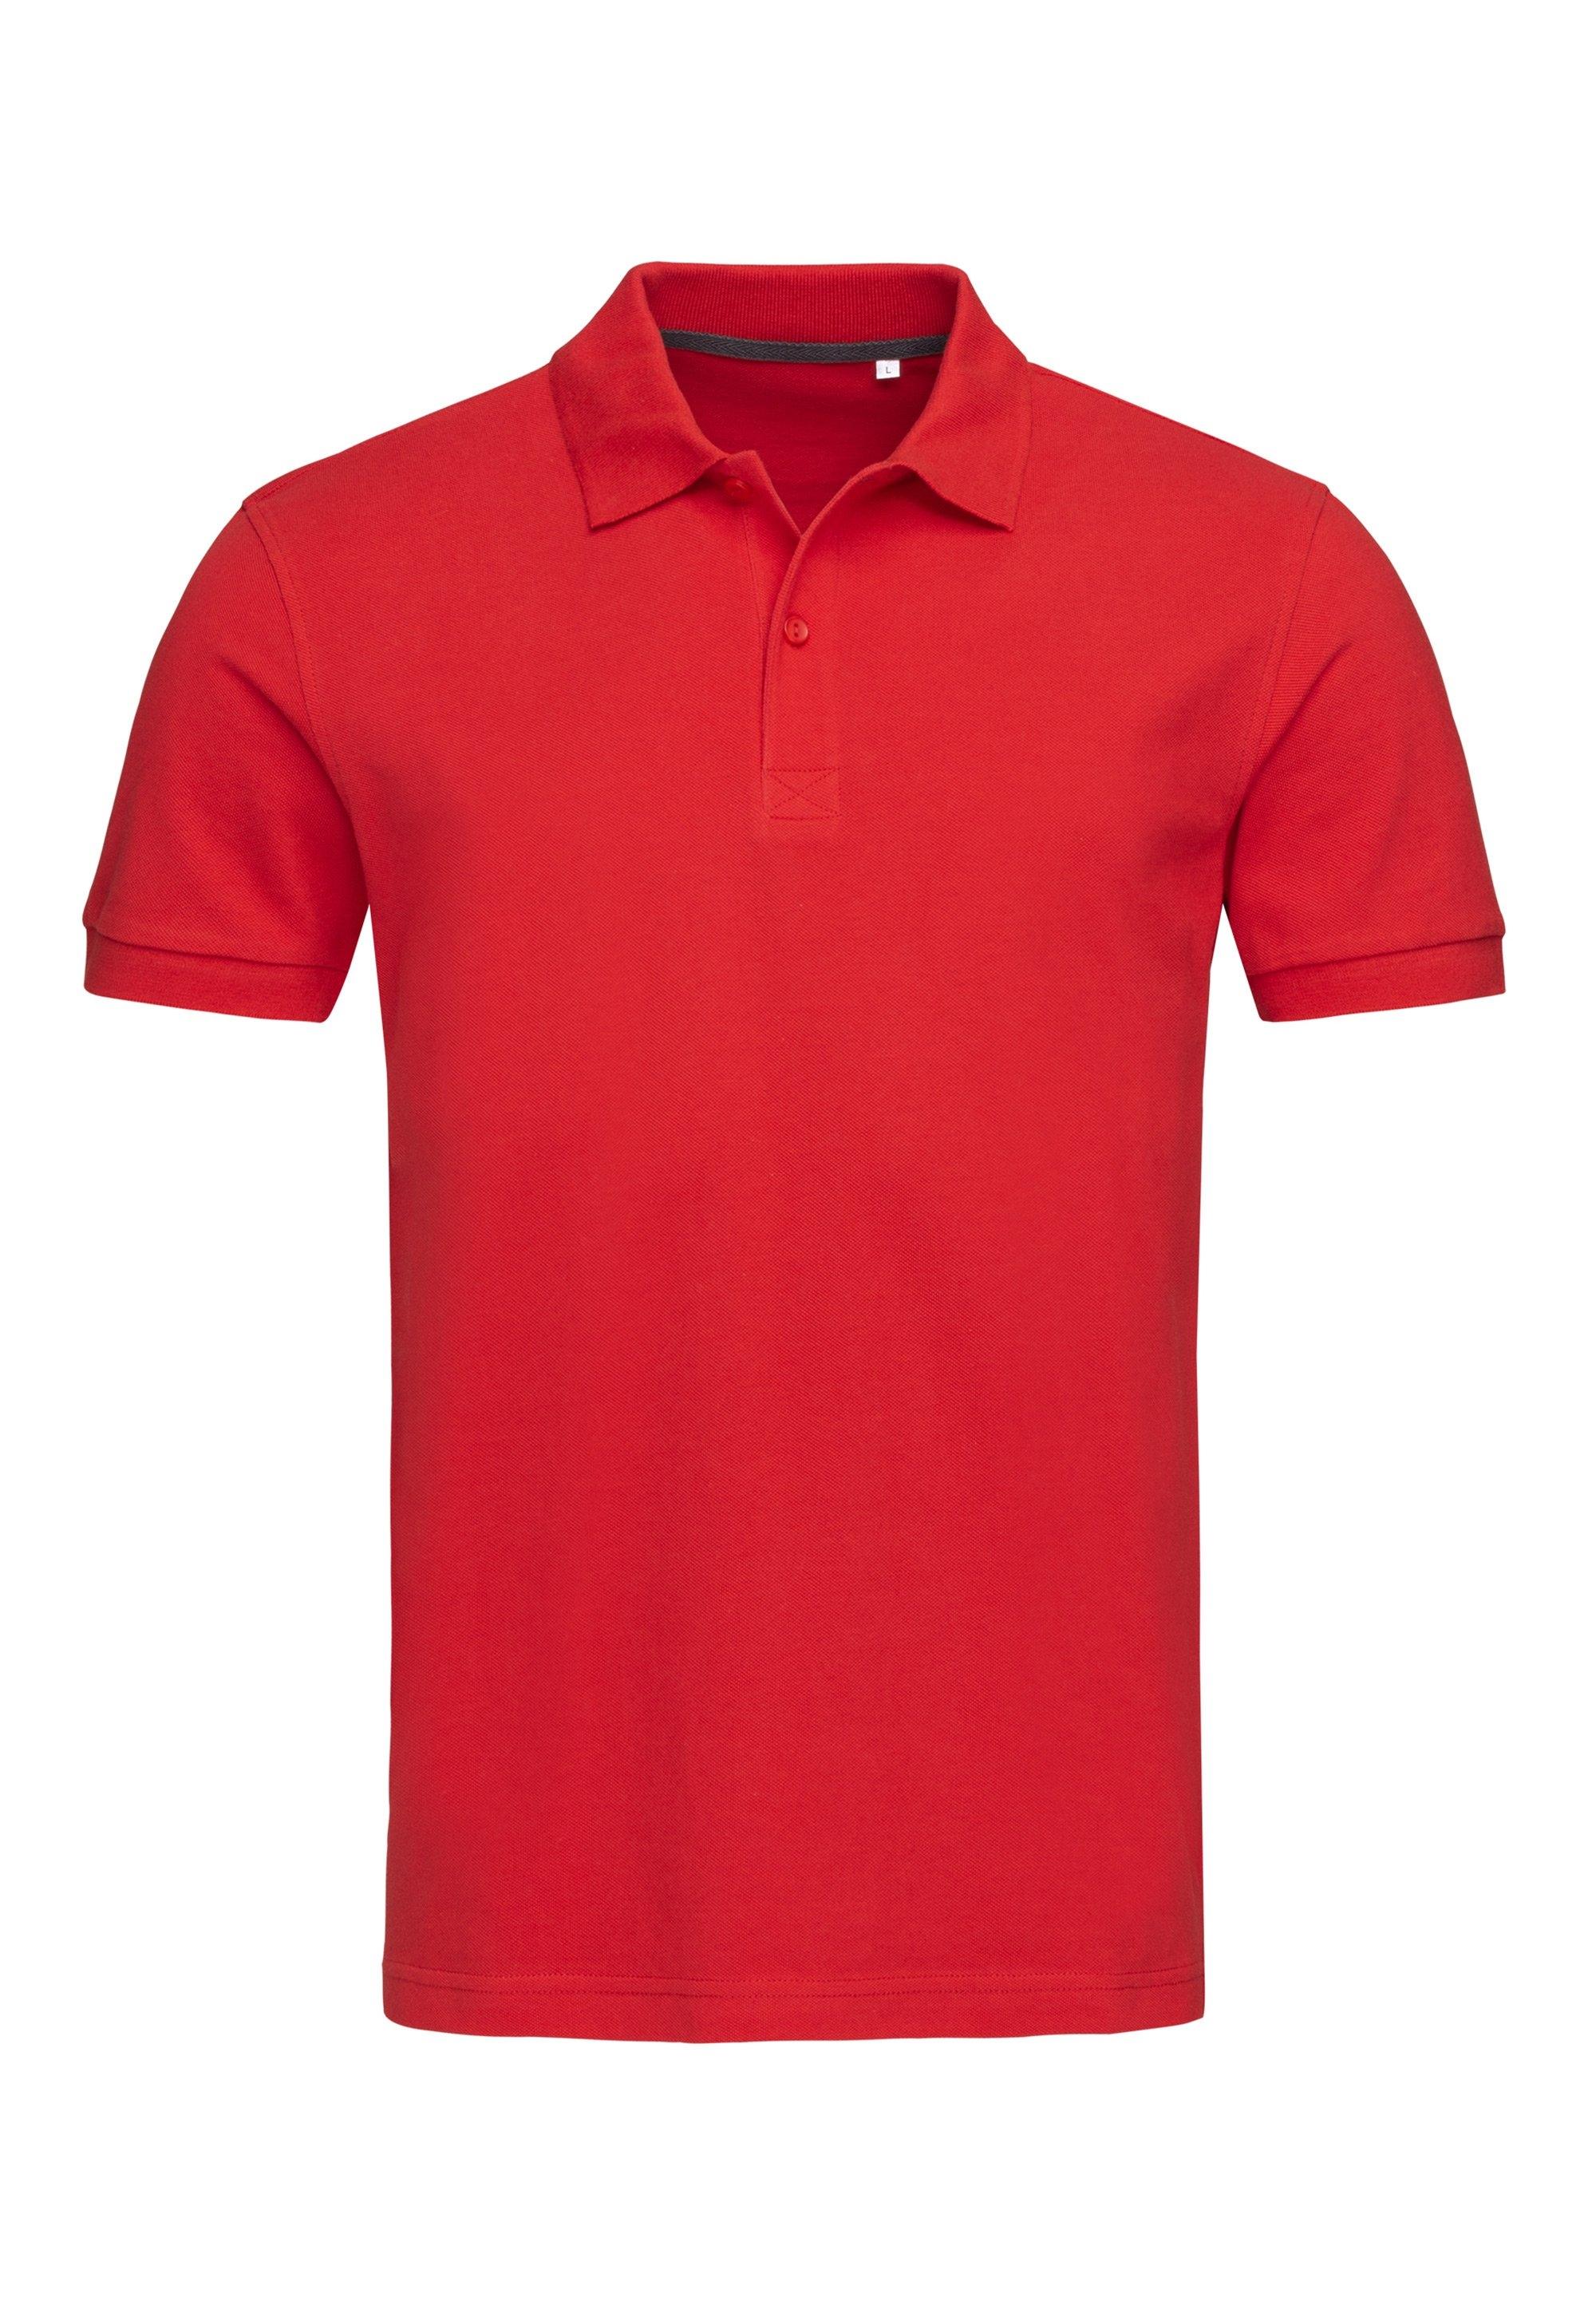 Stedman Poloshirt nu online kopen bij OTTO